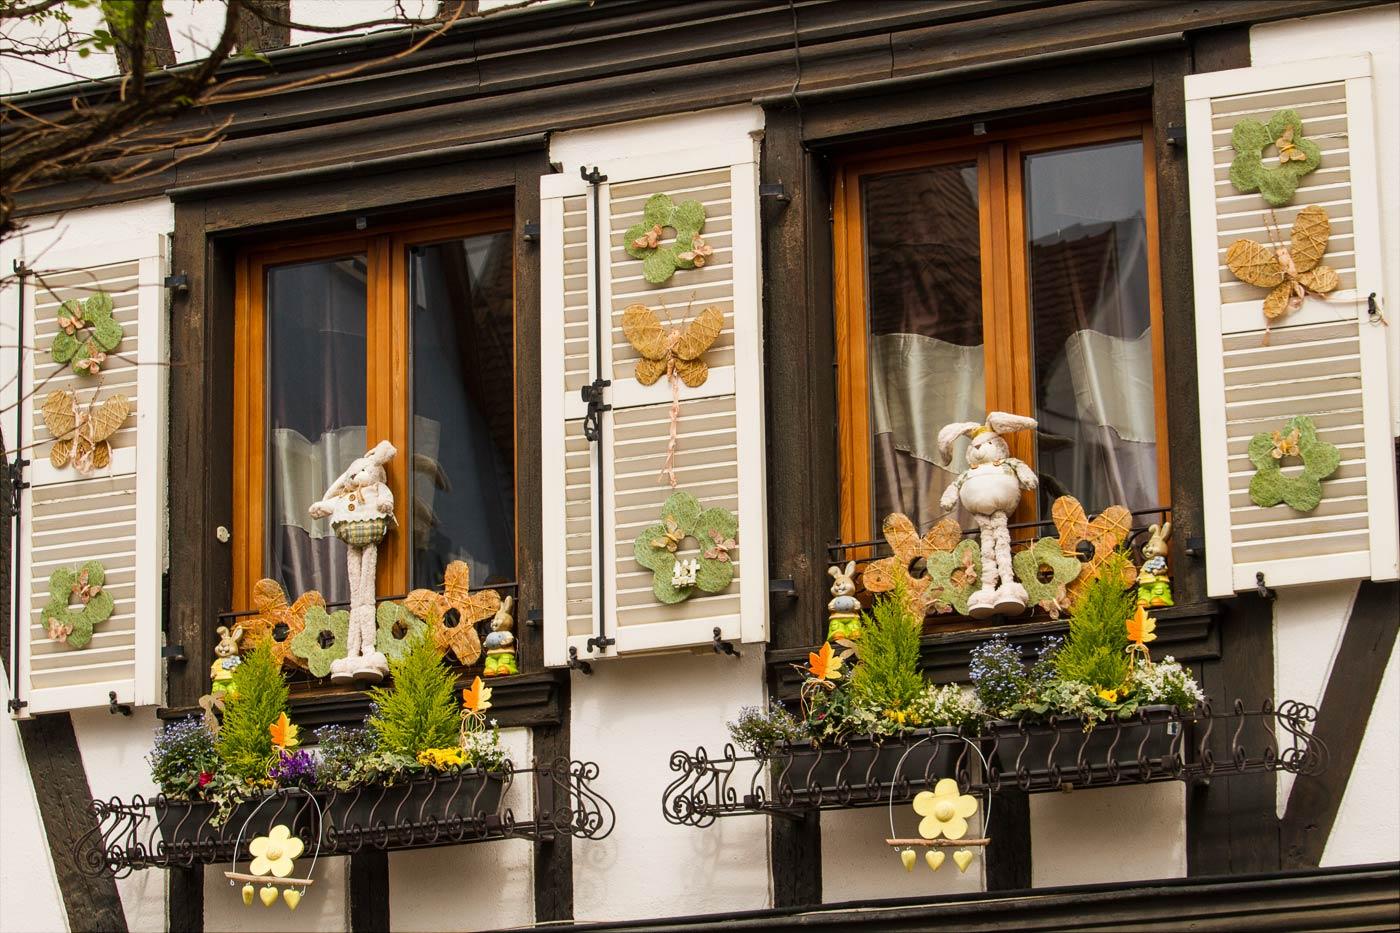 Оберне, Эльзас, Франция